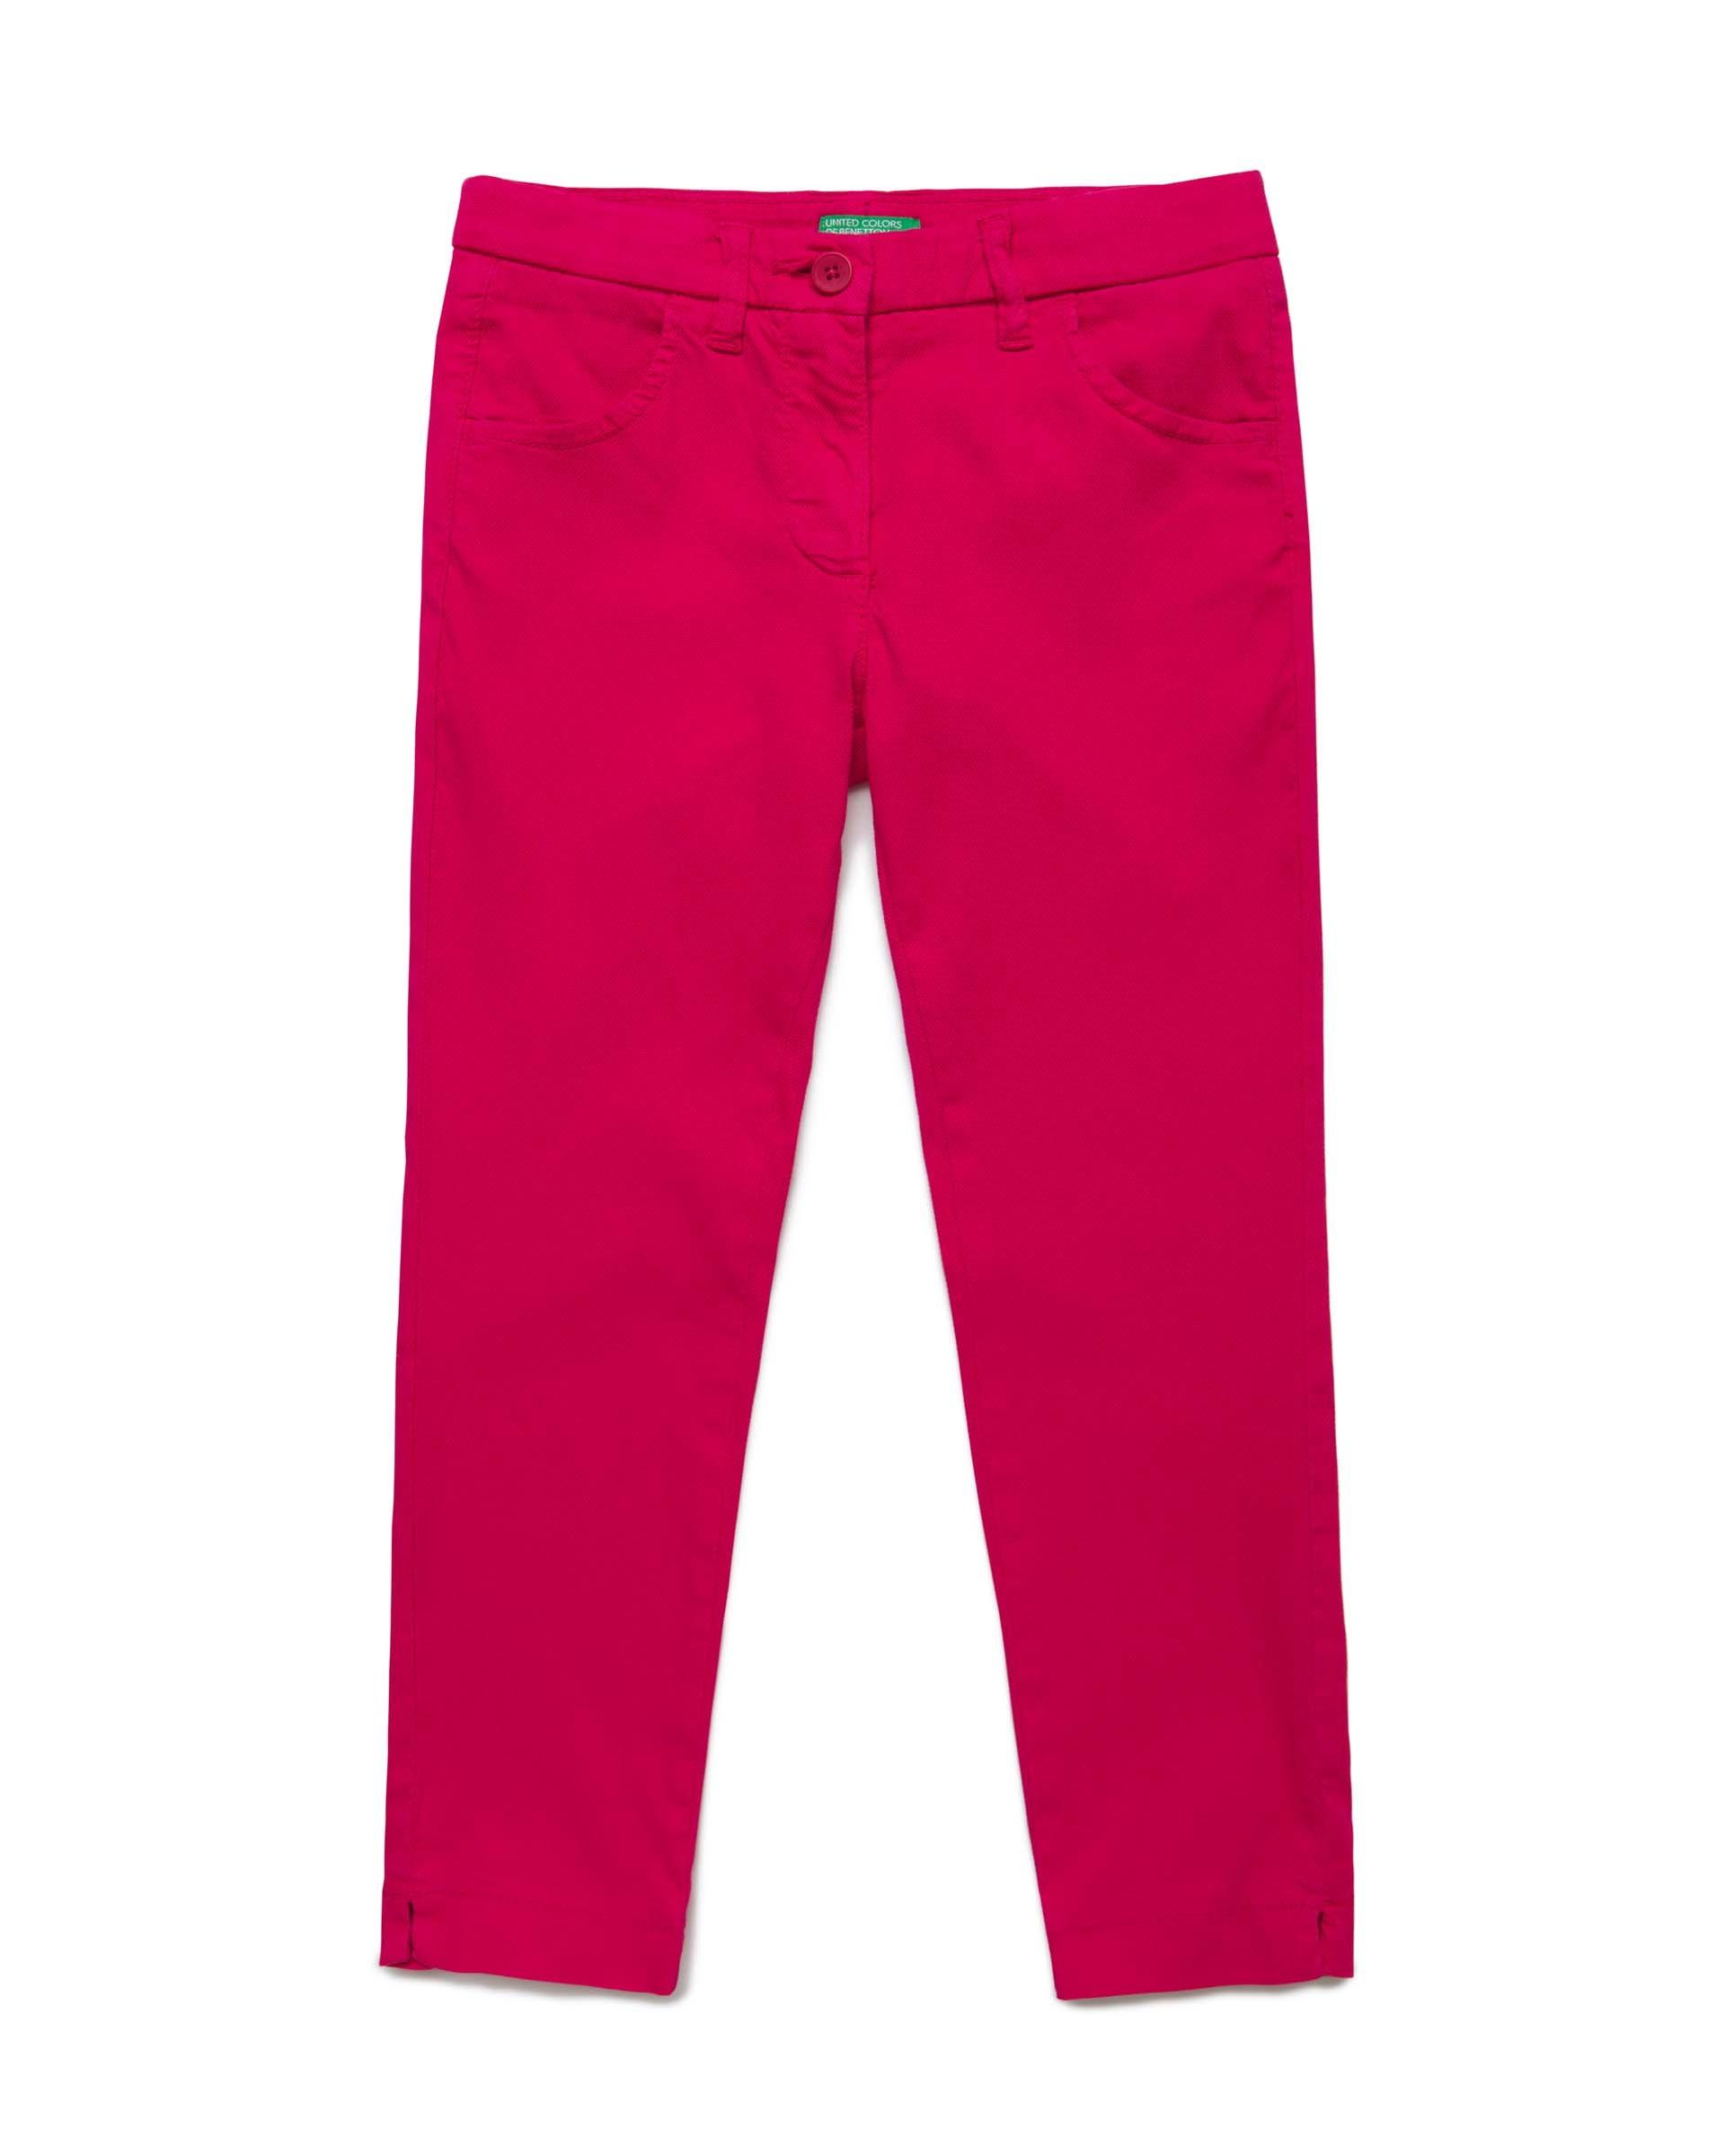 20P_4CDR57LN0_2L3, Брюки для девочек Benetton 4CDR57LN0_2L3 р-р 158, United Colors of Benetton  - купить со скидкой